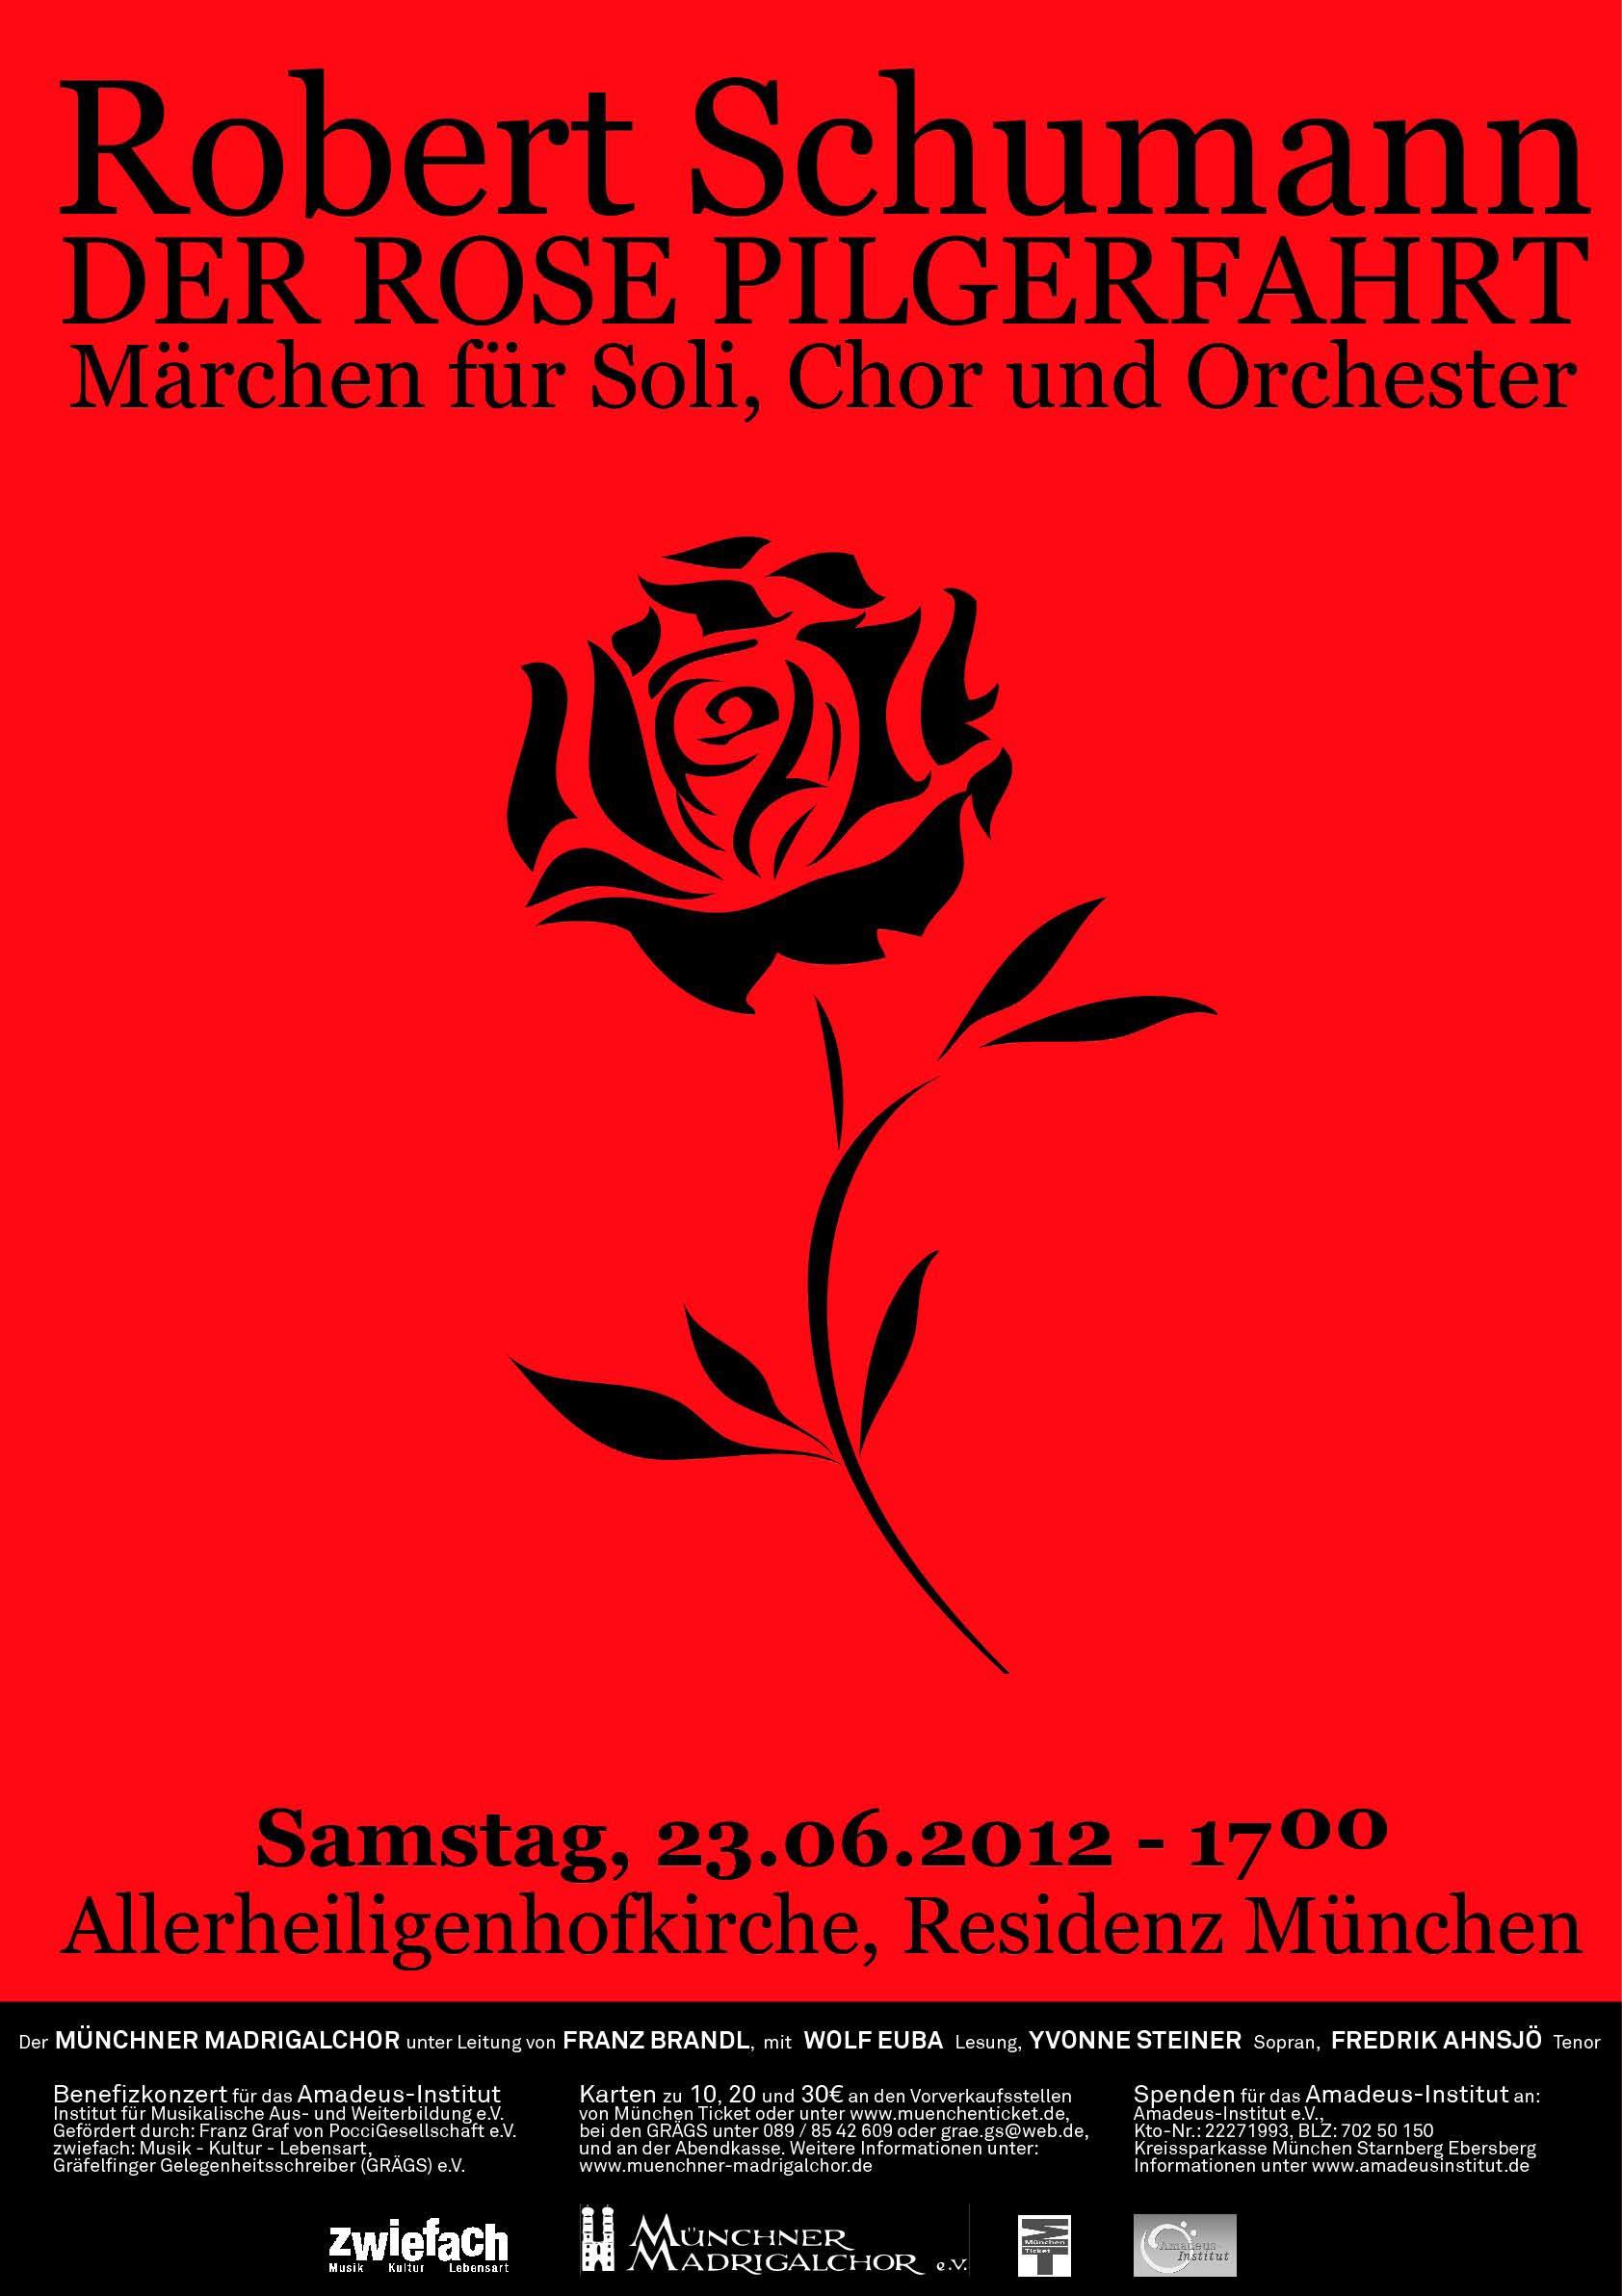 Benefizkonzert Allerheiliehn Hofkirche